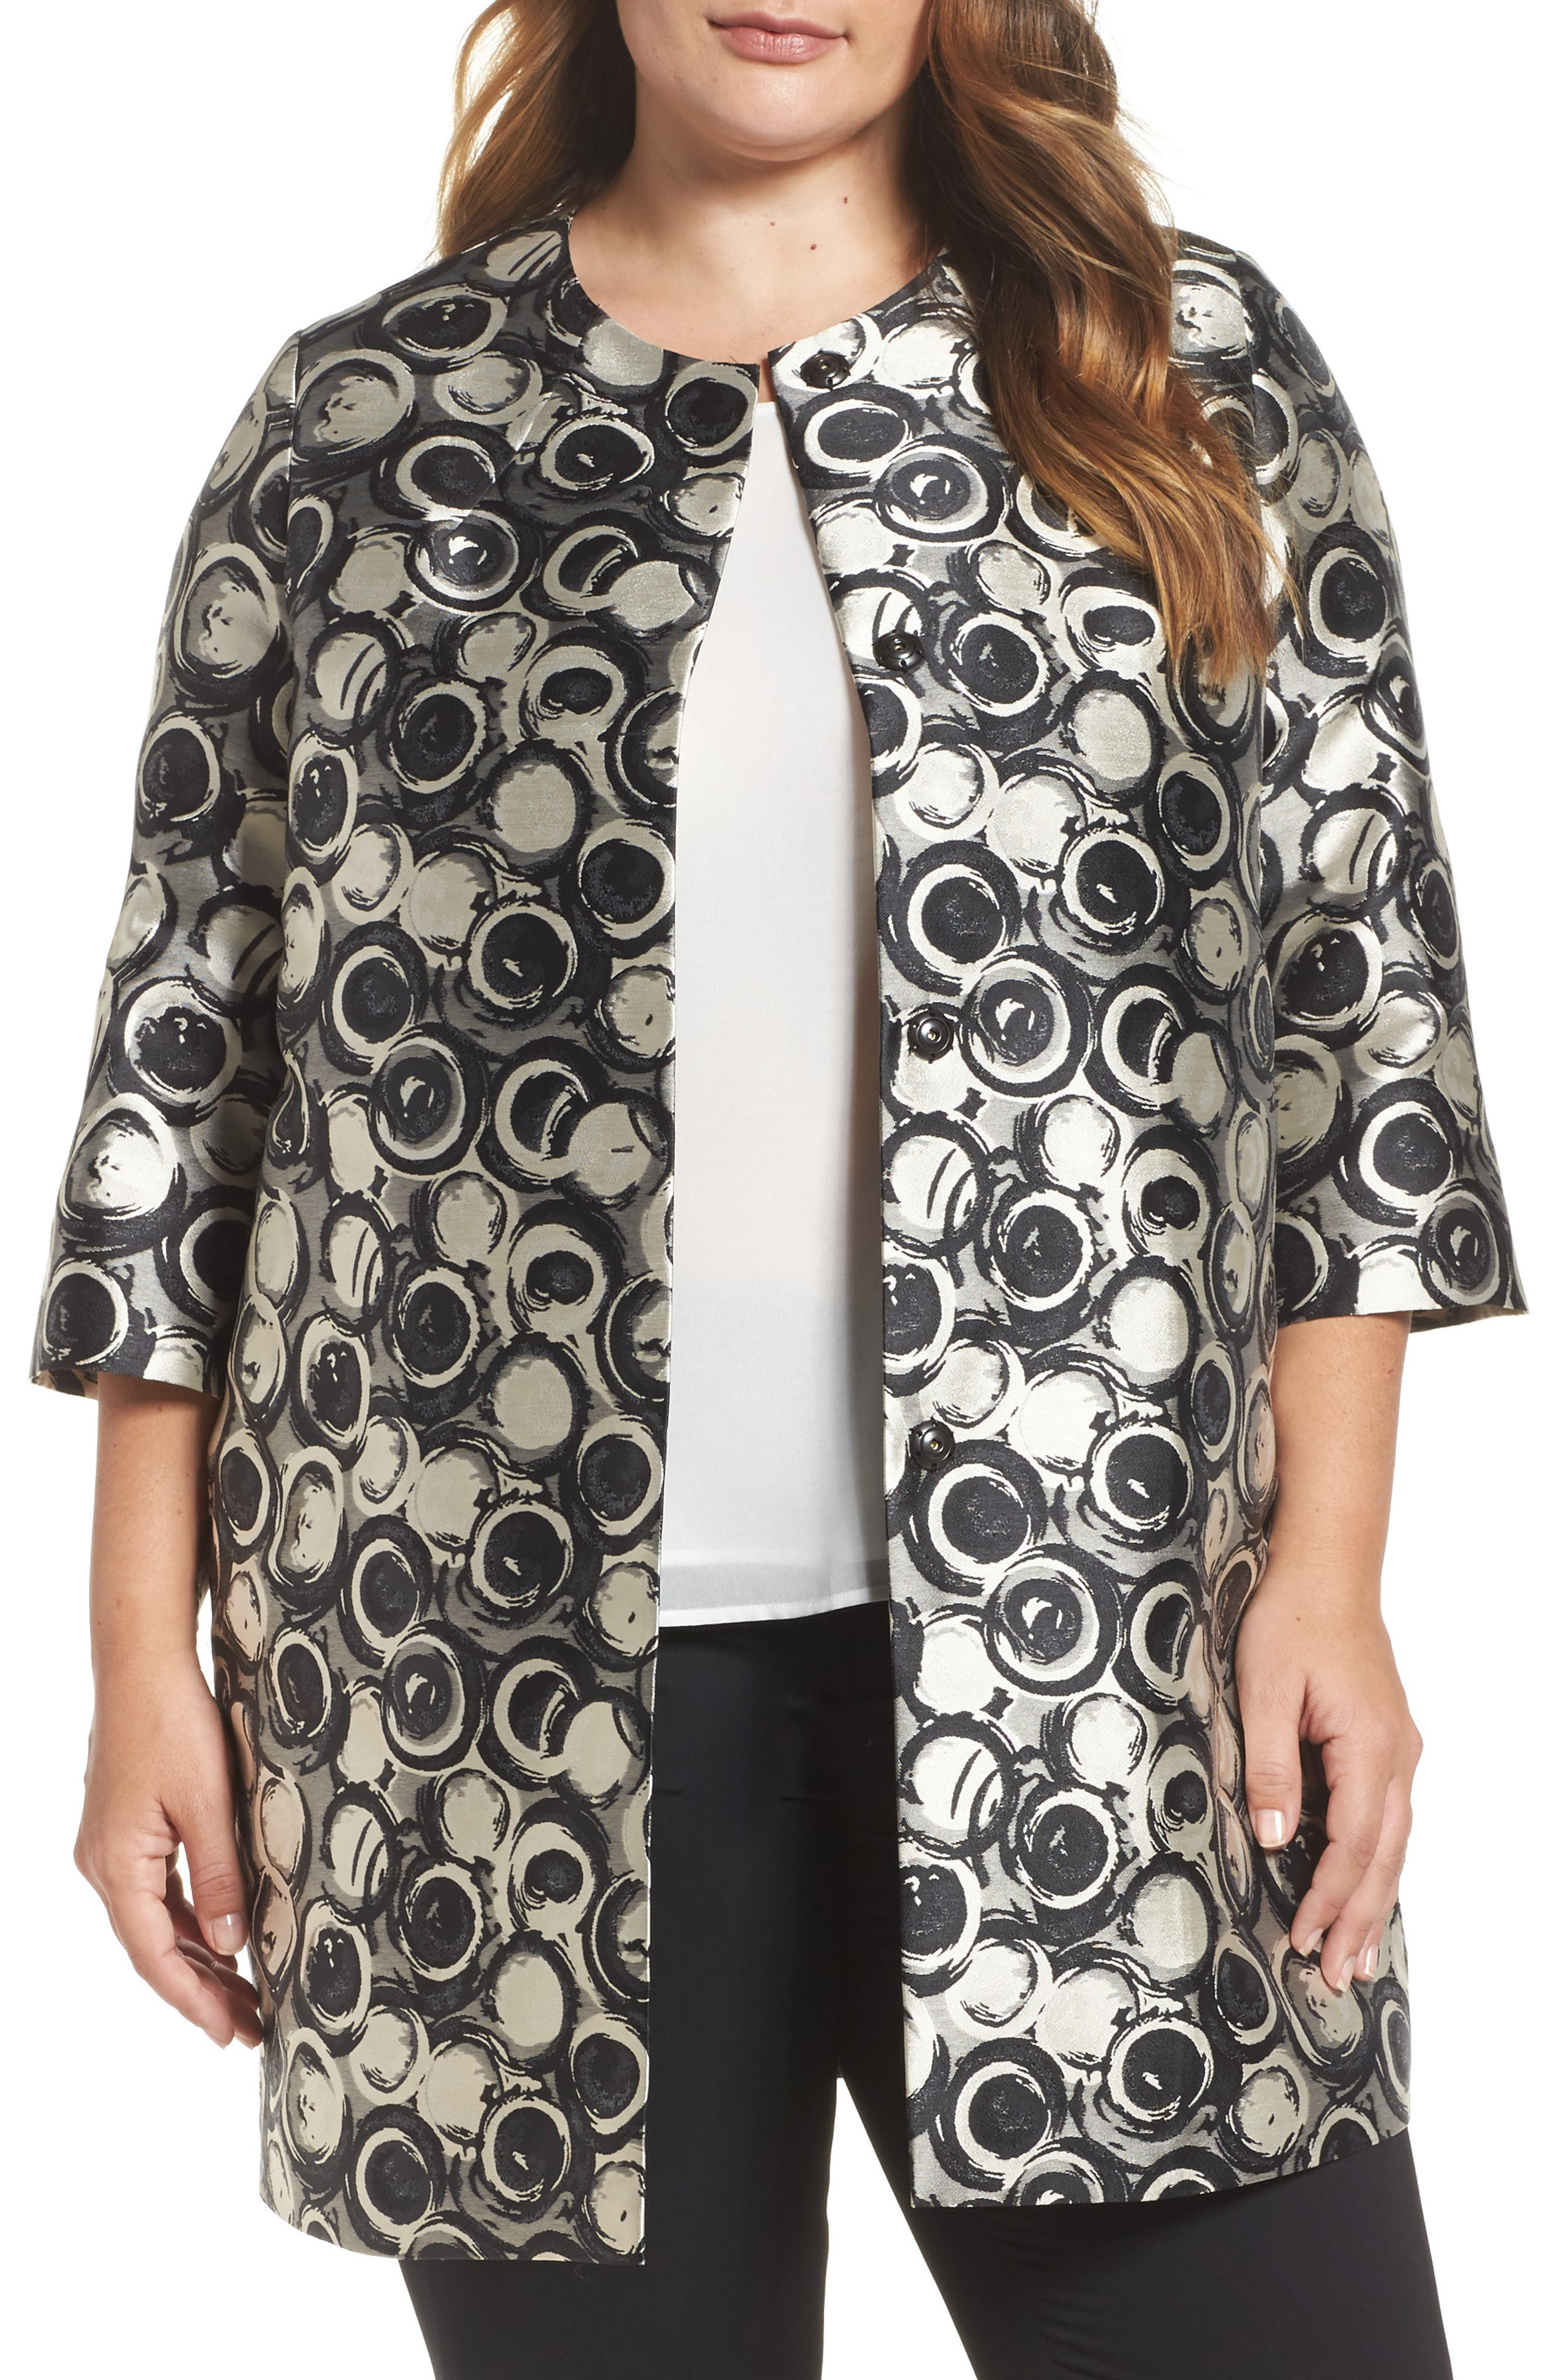 Noa Jacquard Jacket,                         Main,                         color, Black